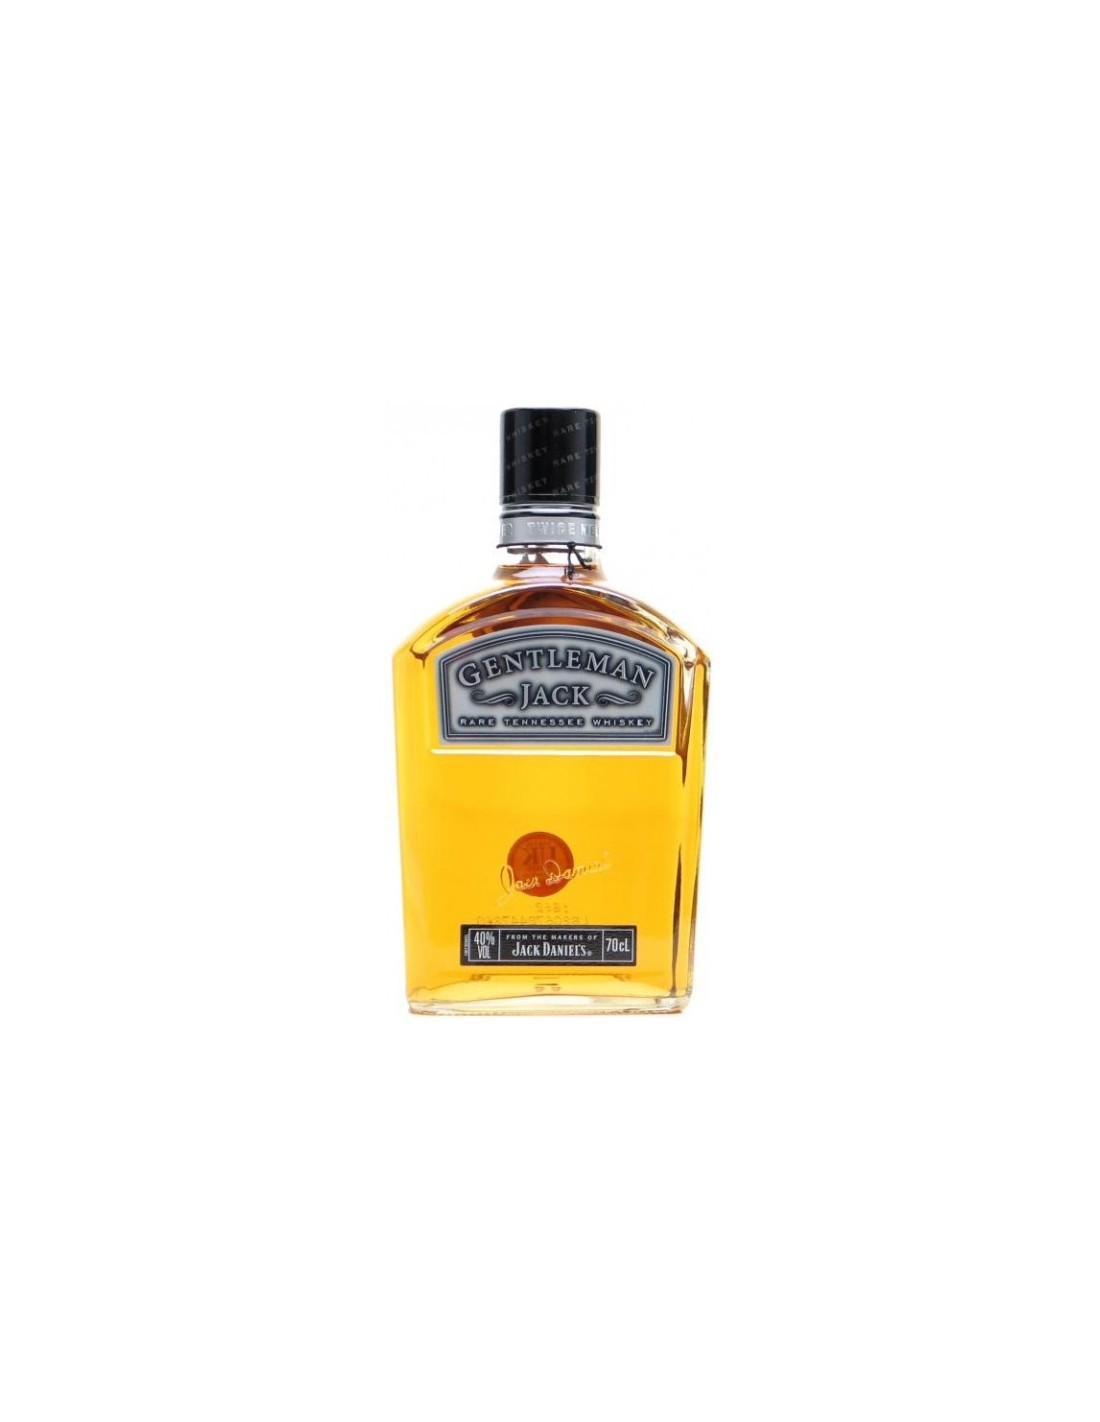 Whisky Bourbon Gentleman Jack, 40% alc., 0.7L, America